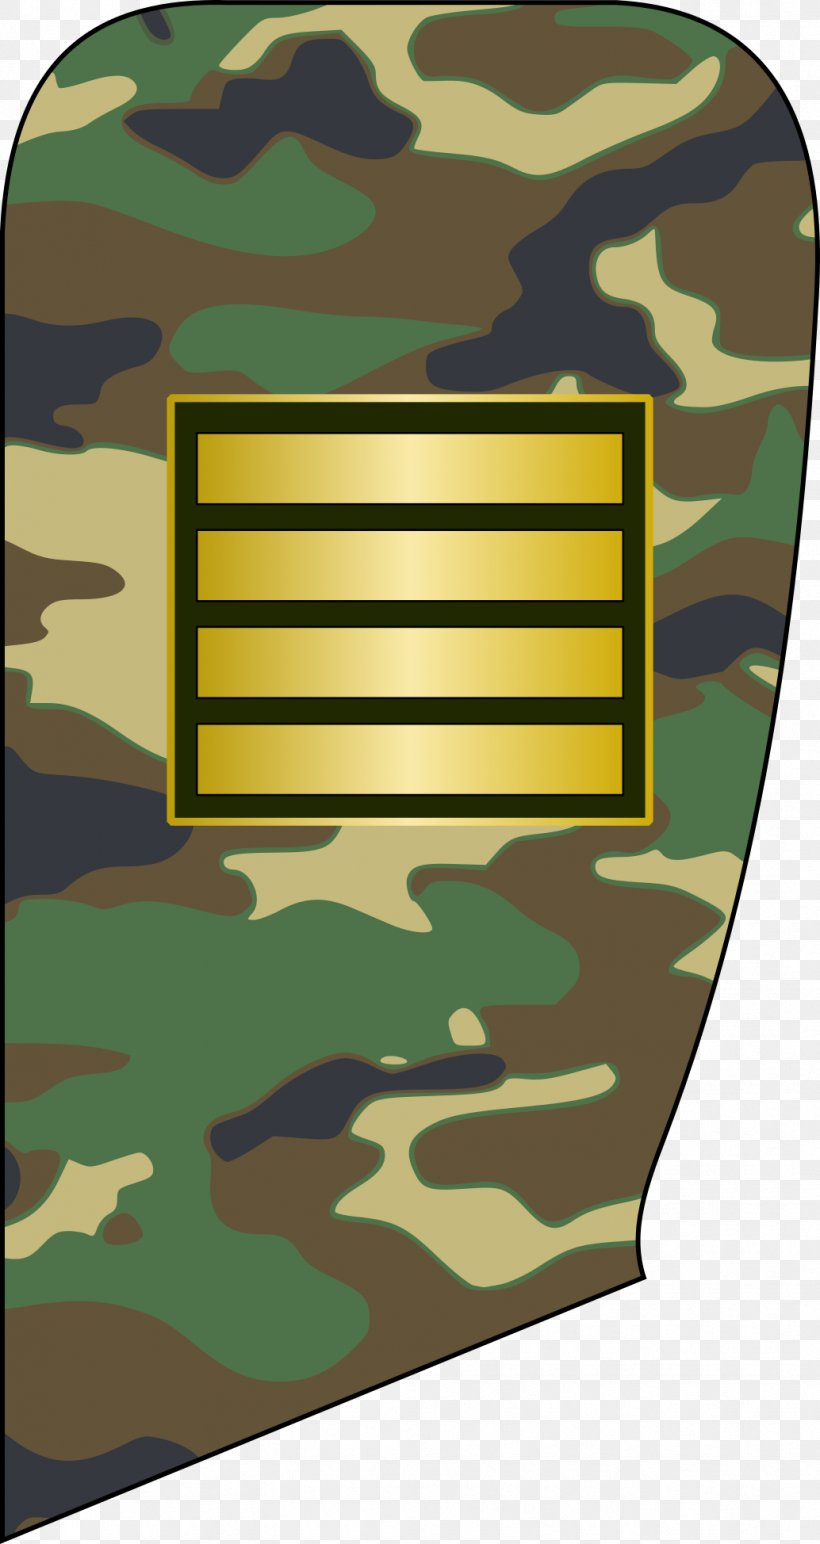 Military Camouflage Desktop Wallpaper Universal Camouflage